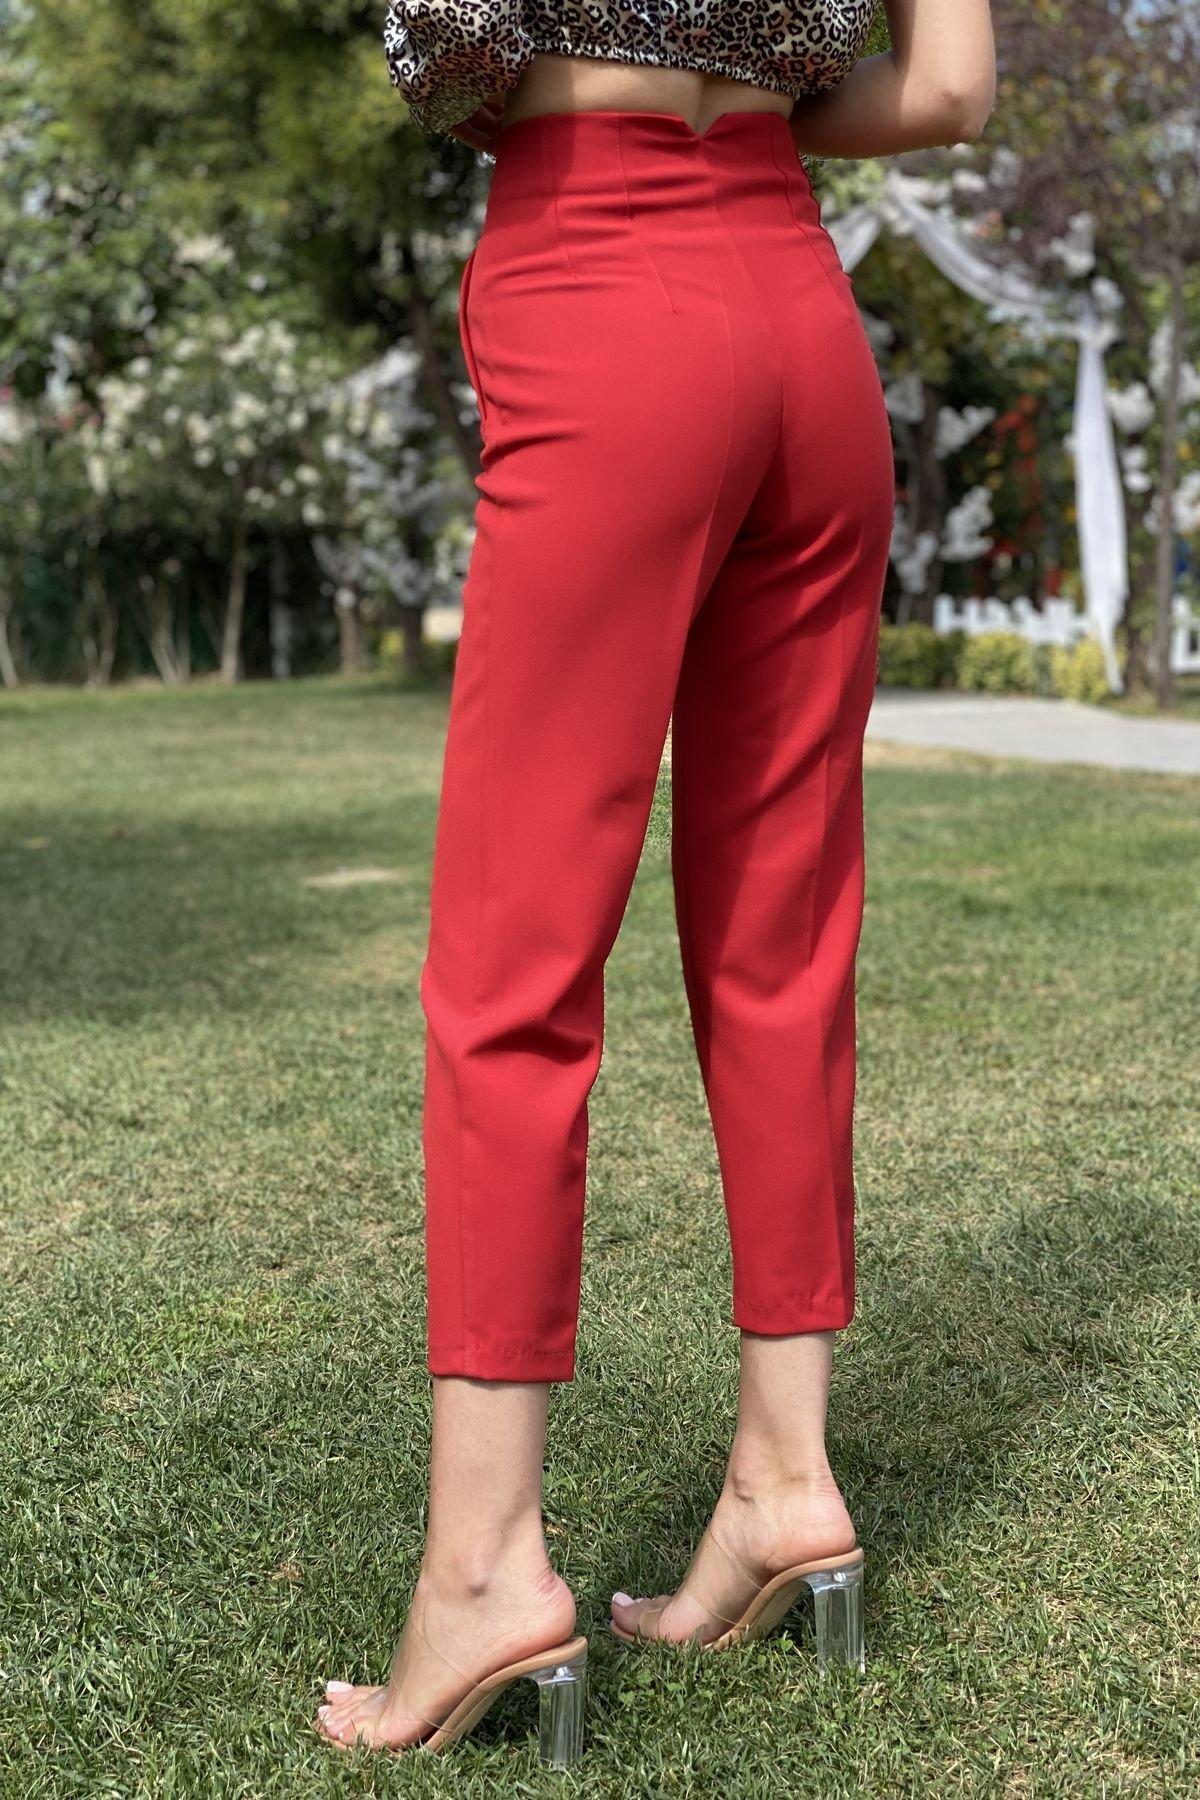 Krl 5113 Önü Flatolu Pantalon